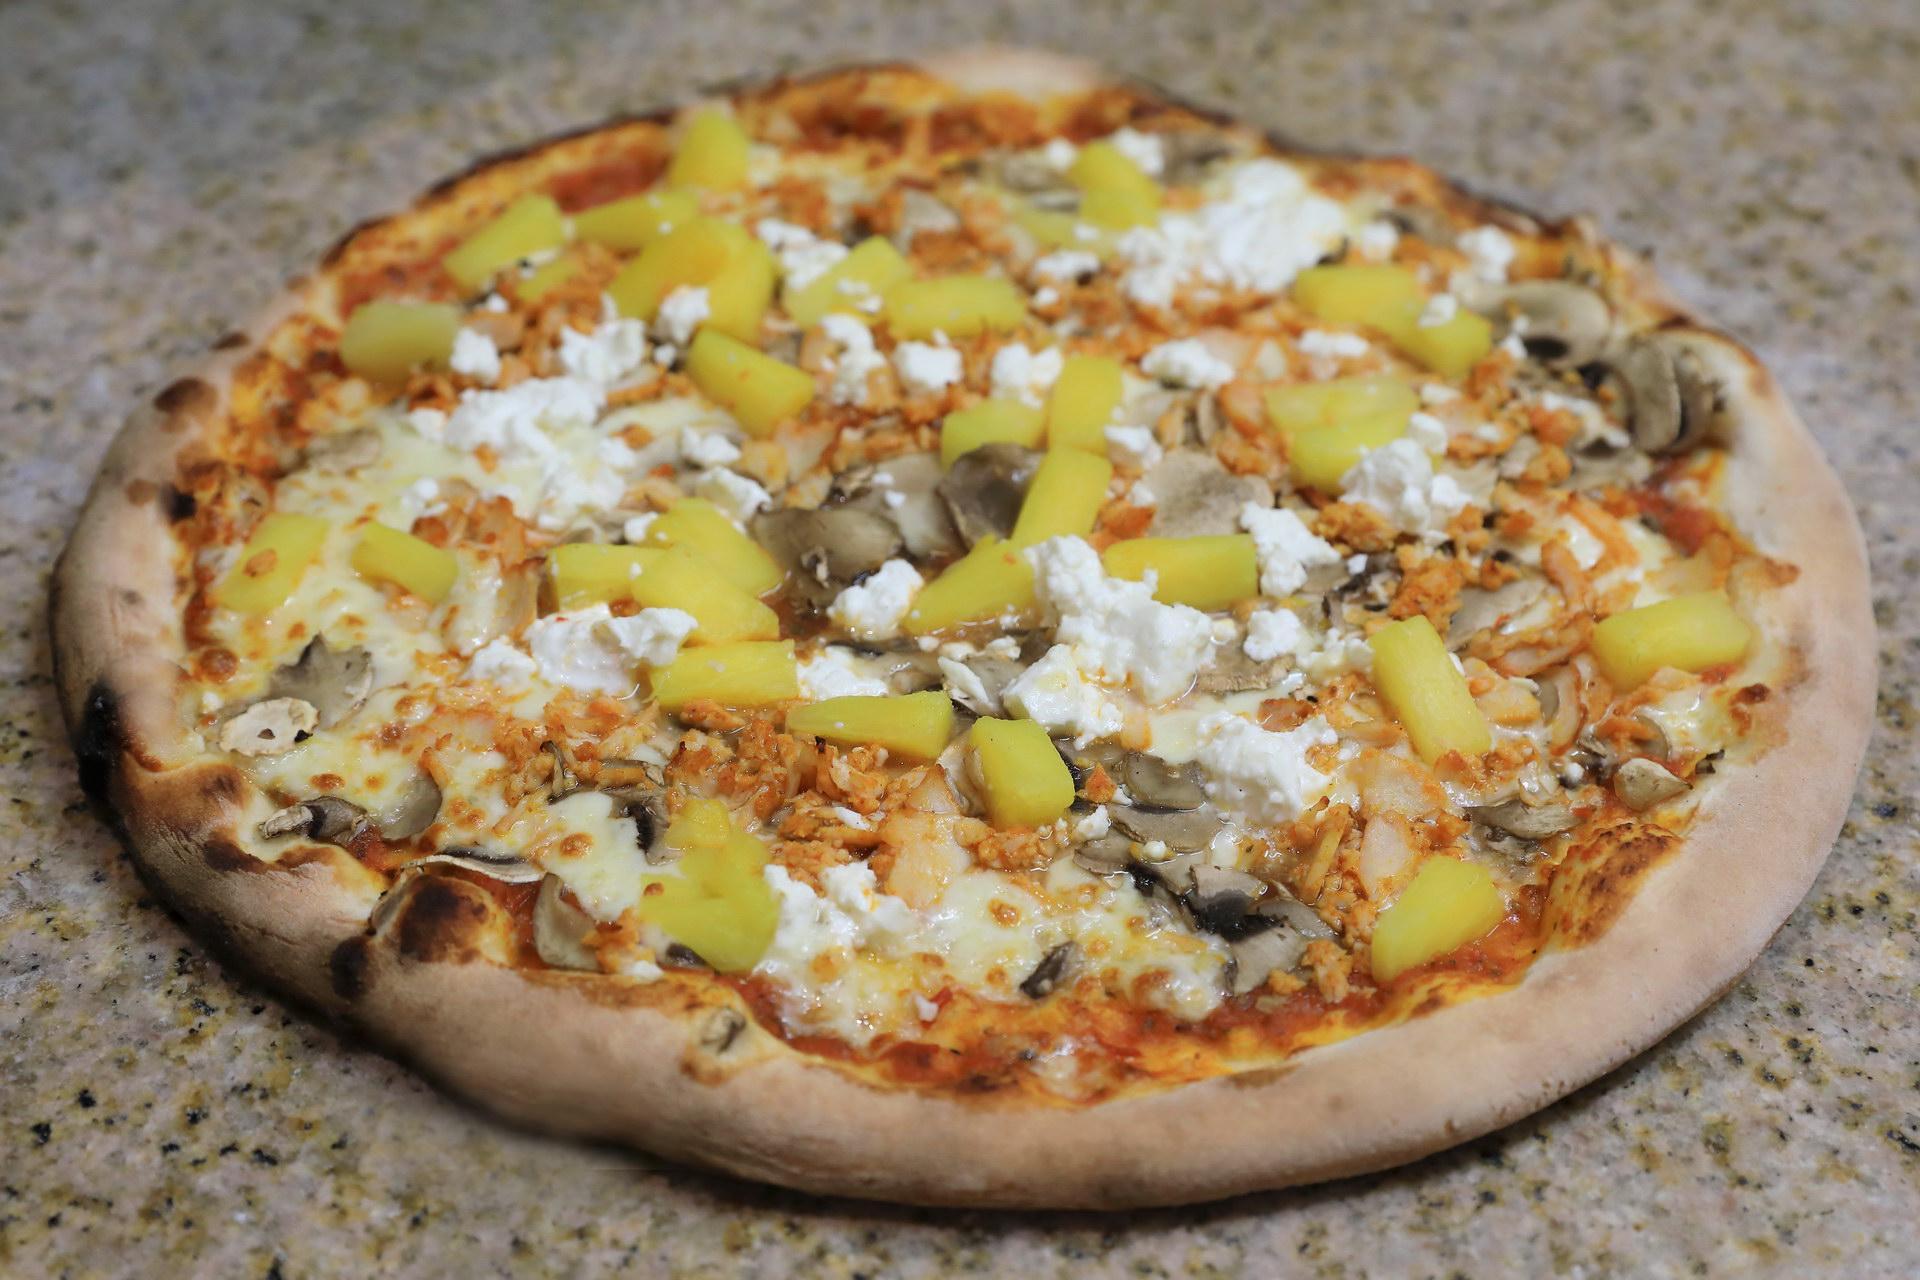 Le-Mediterraneen-Pizza-Braine-l-Alleud-0052.jpg